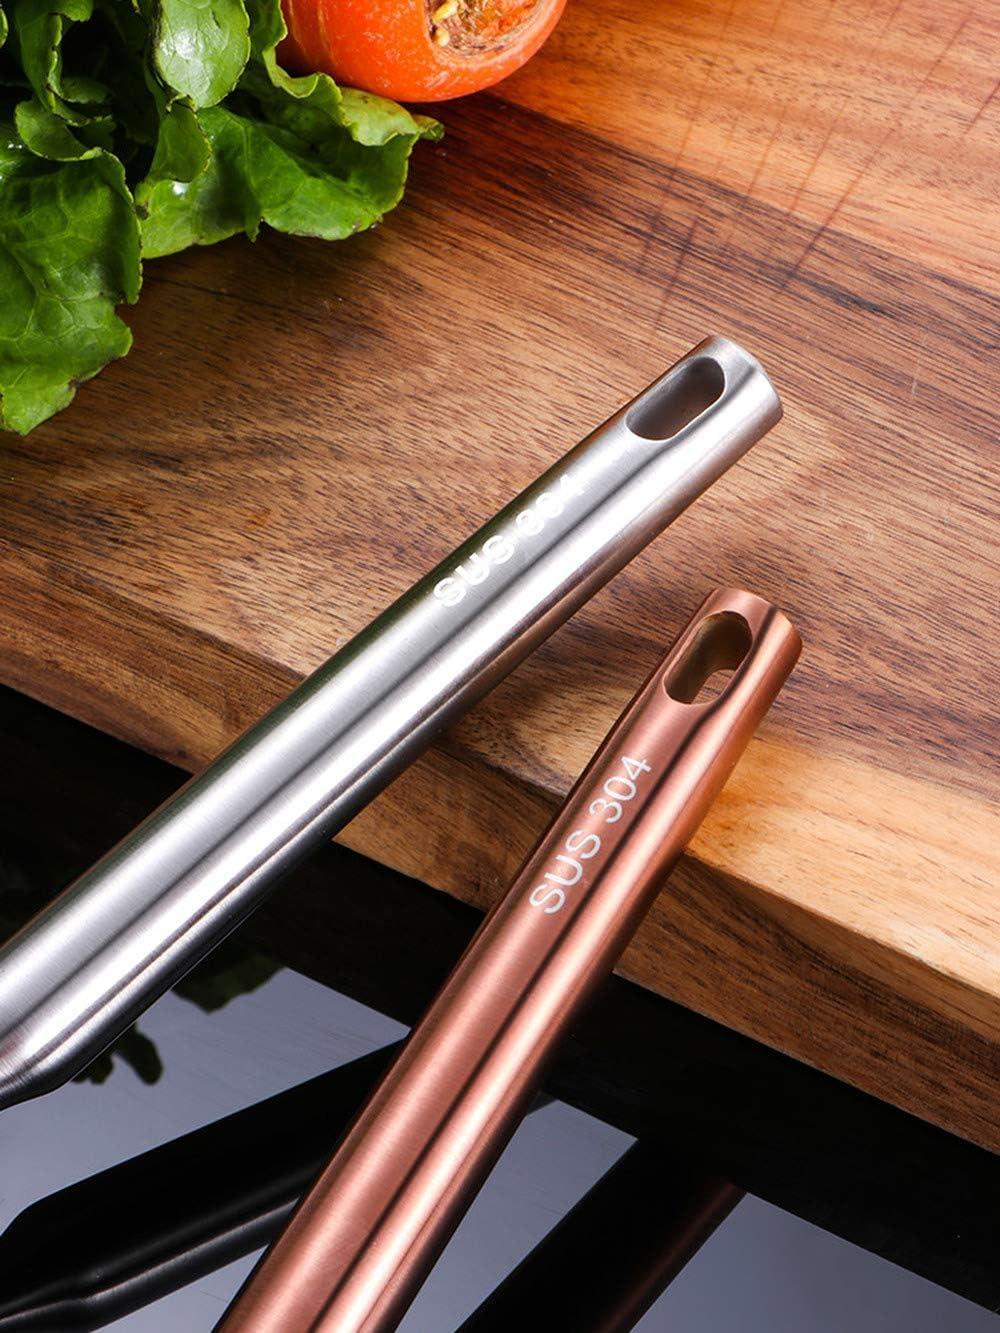 Fruit Peeler Vegetable Peeler Potato Peeler Time-Saving Kitchen Tools 304 Stainless Steel Material. Black